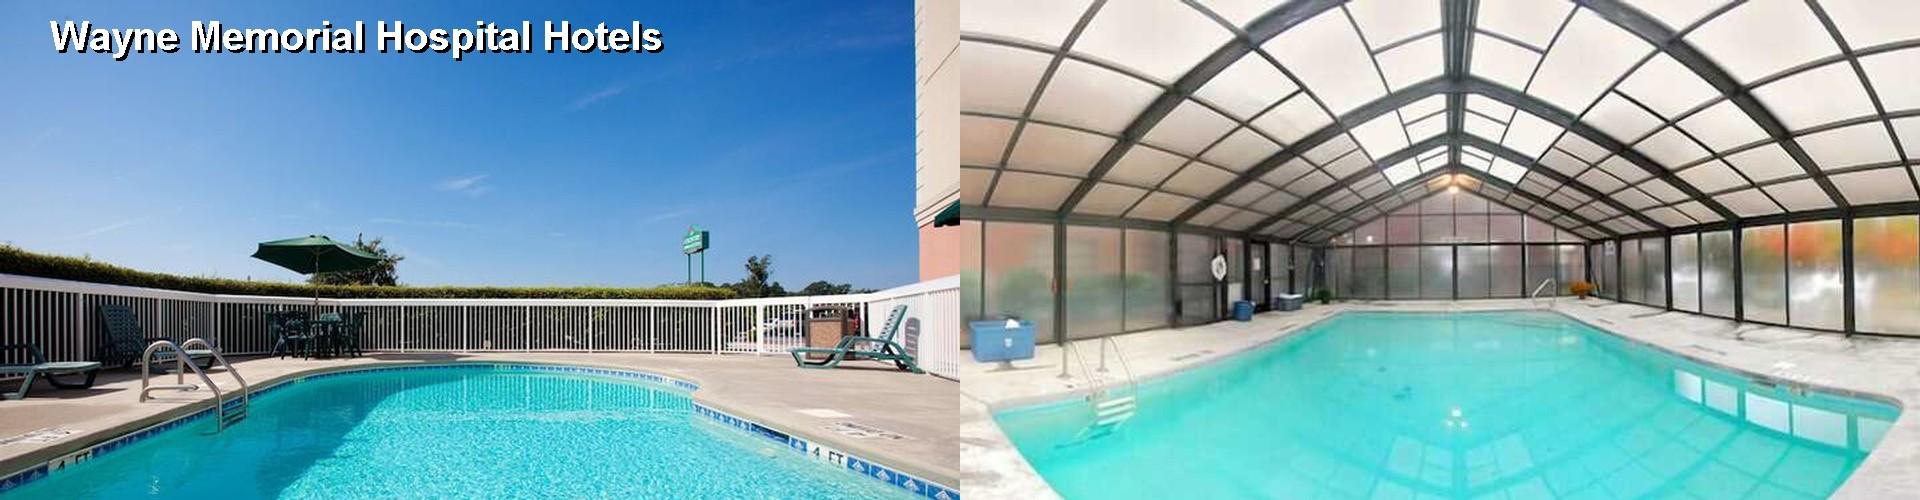 5 Best Hotels Near Wayne Memorial Hospital